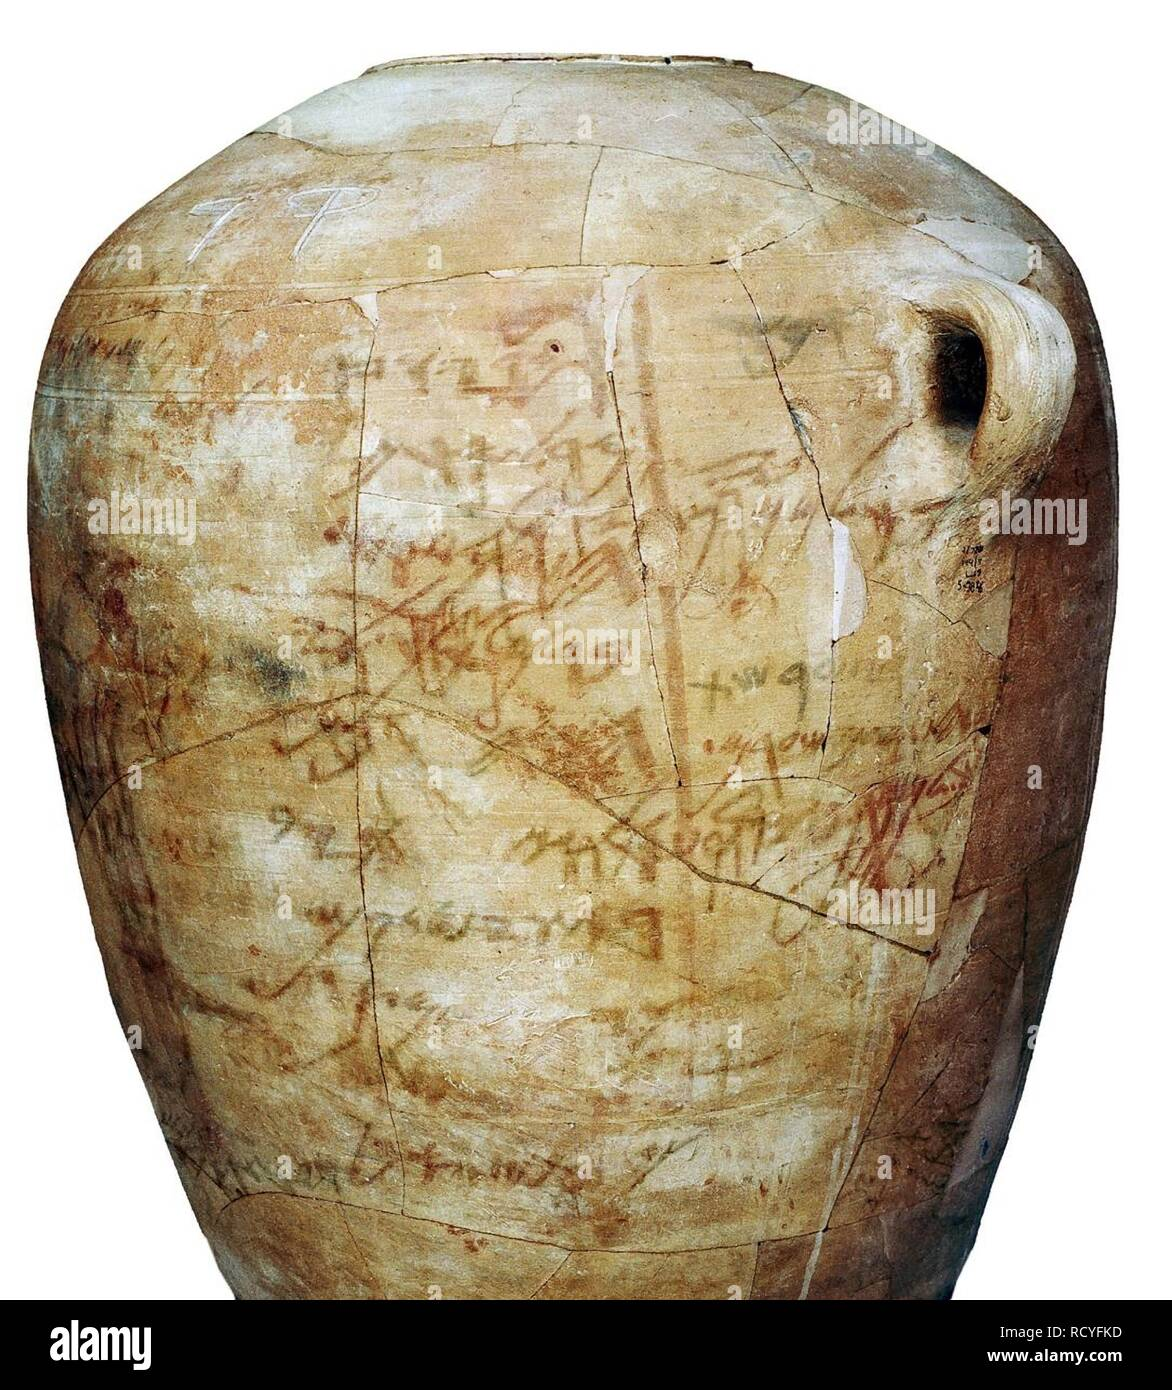 6424. Kuntilet Ajrud, a large ceramic jar inscribed with the Hebrew Alphabet, Northern Sinai, c. 800 BC. - Stock Image